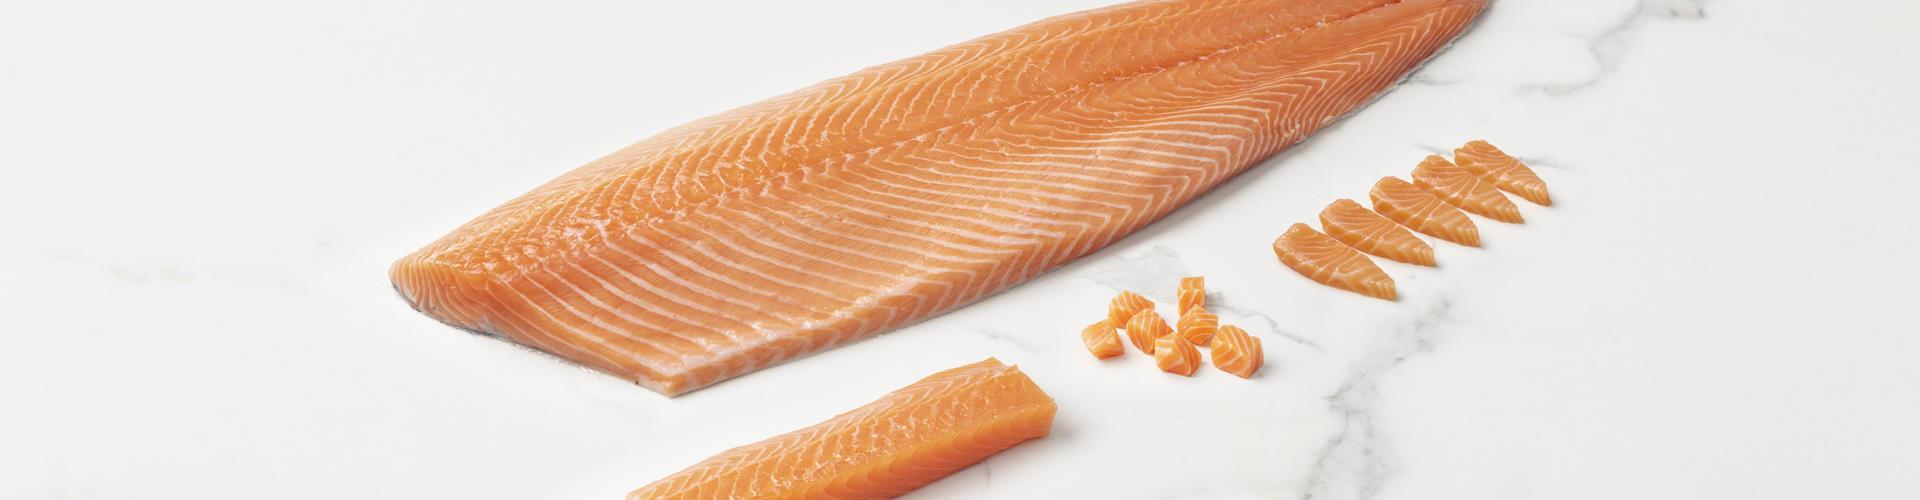 filet fisk